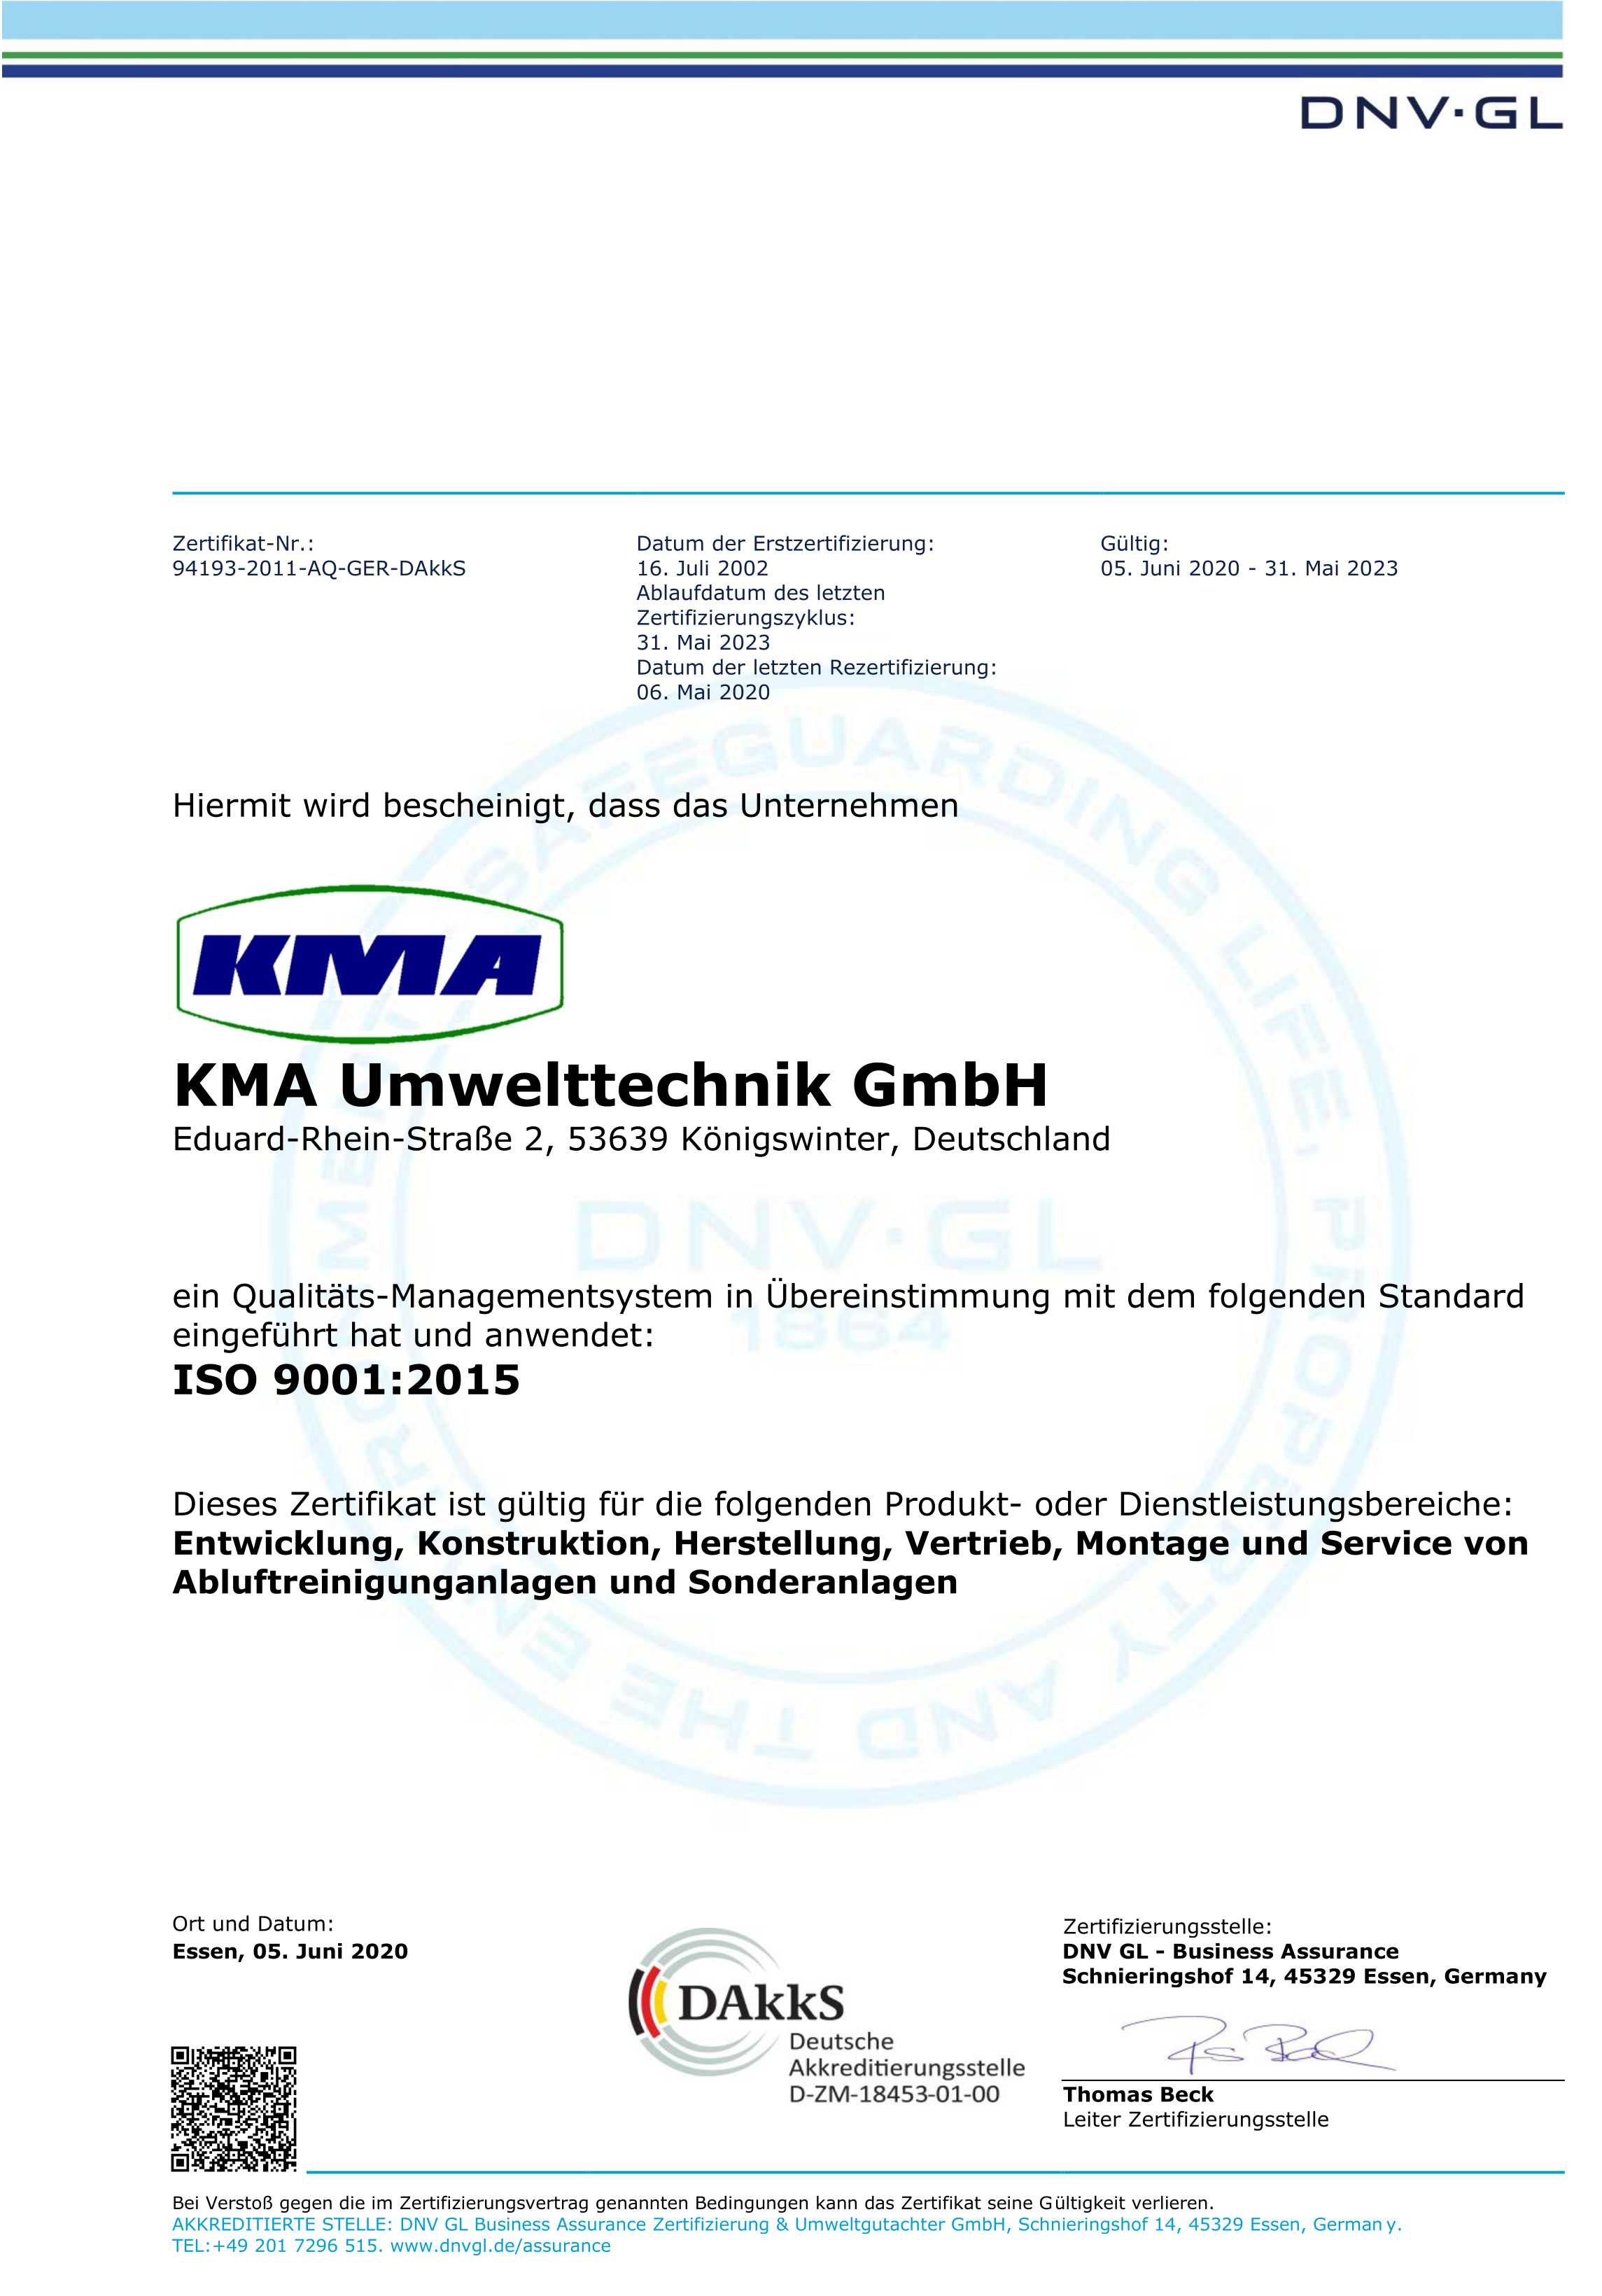 KMA ISO Management System Zertifikat